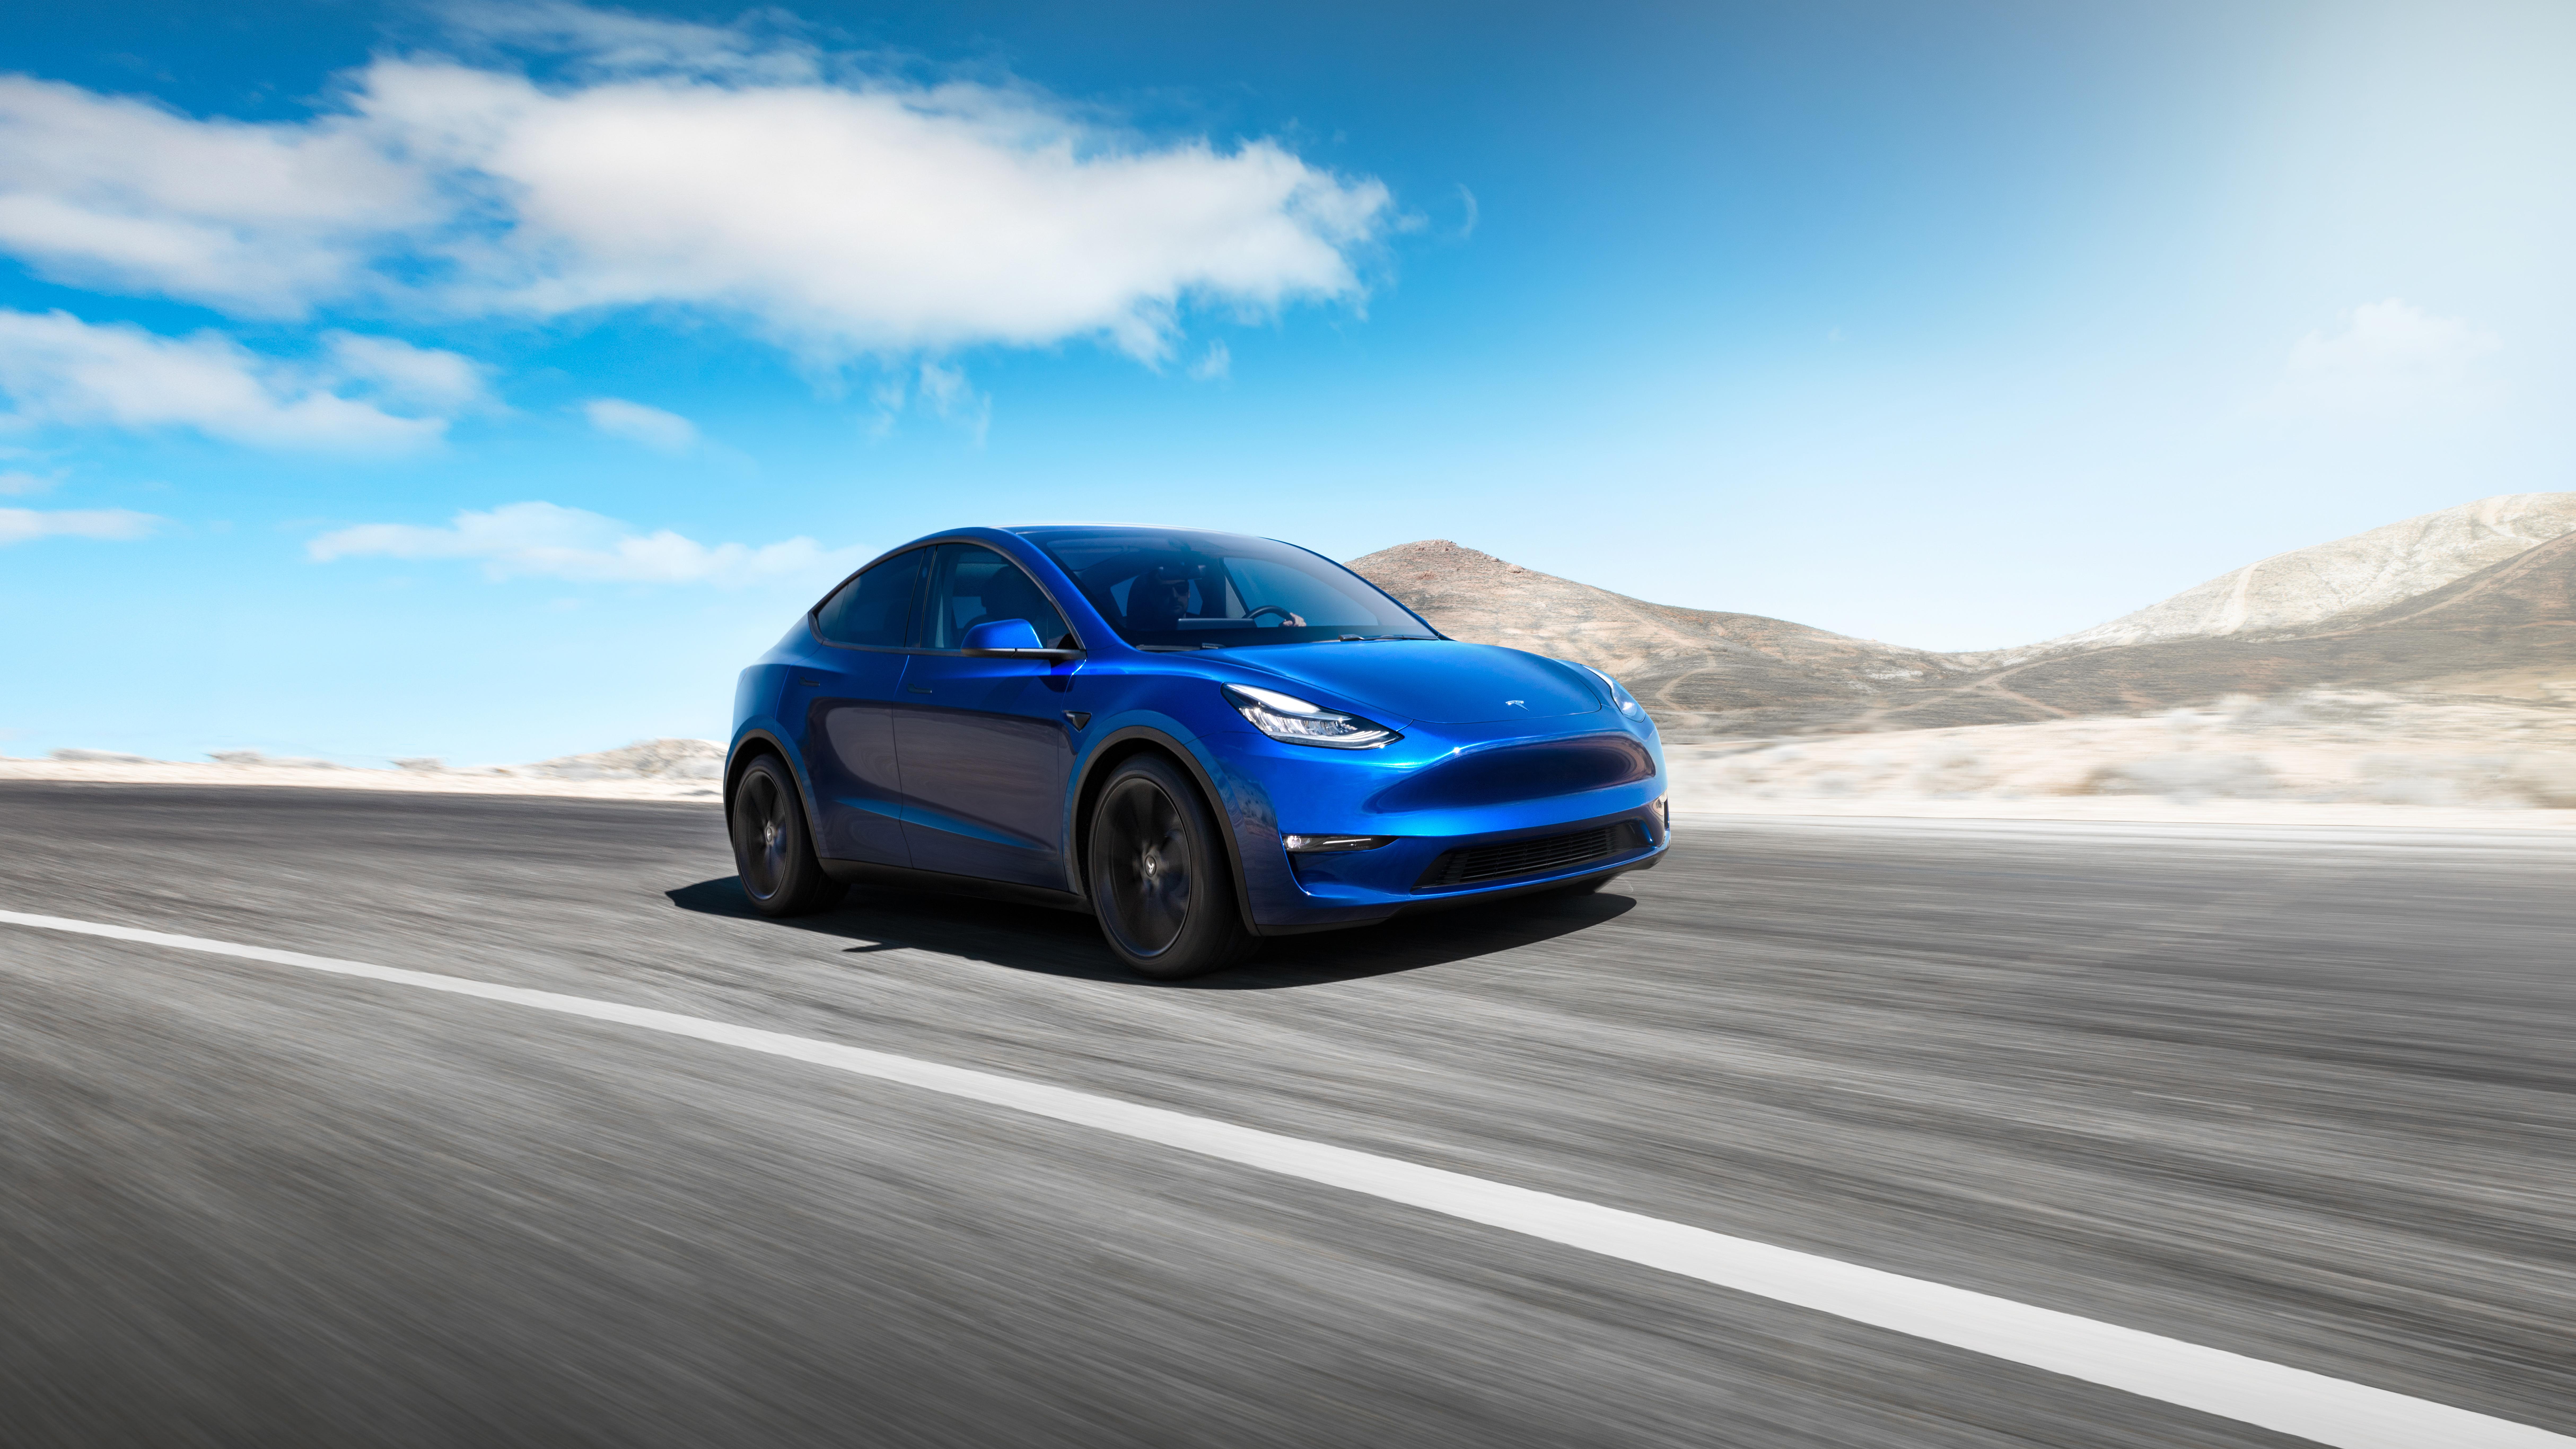 2019 Tesla Model Y Hd Cars 4k Wallpapers Images